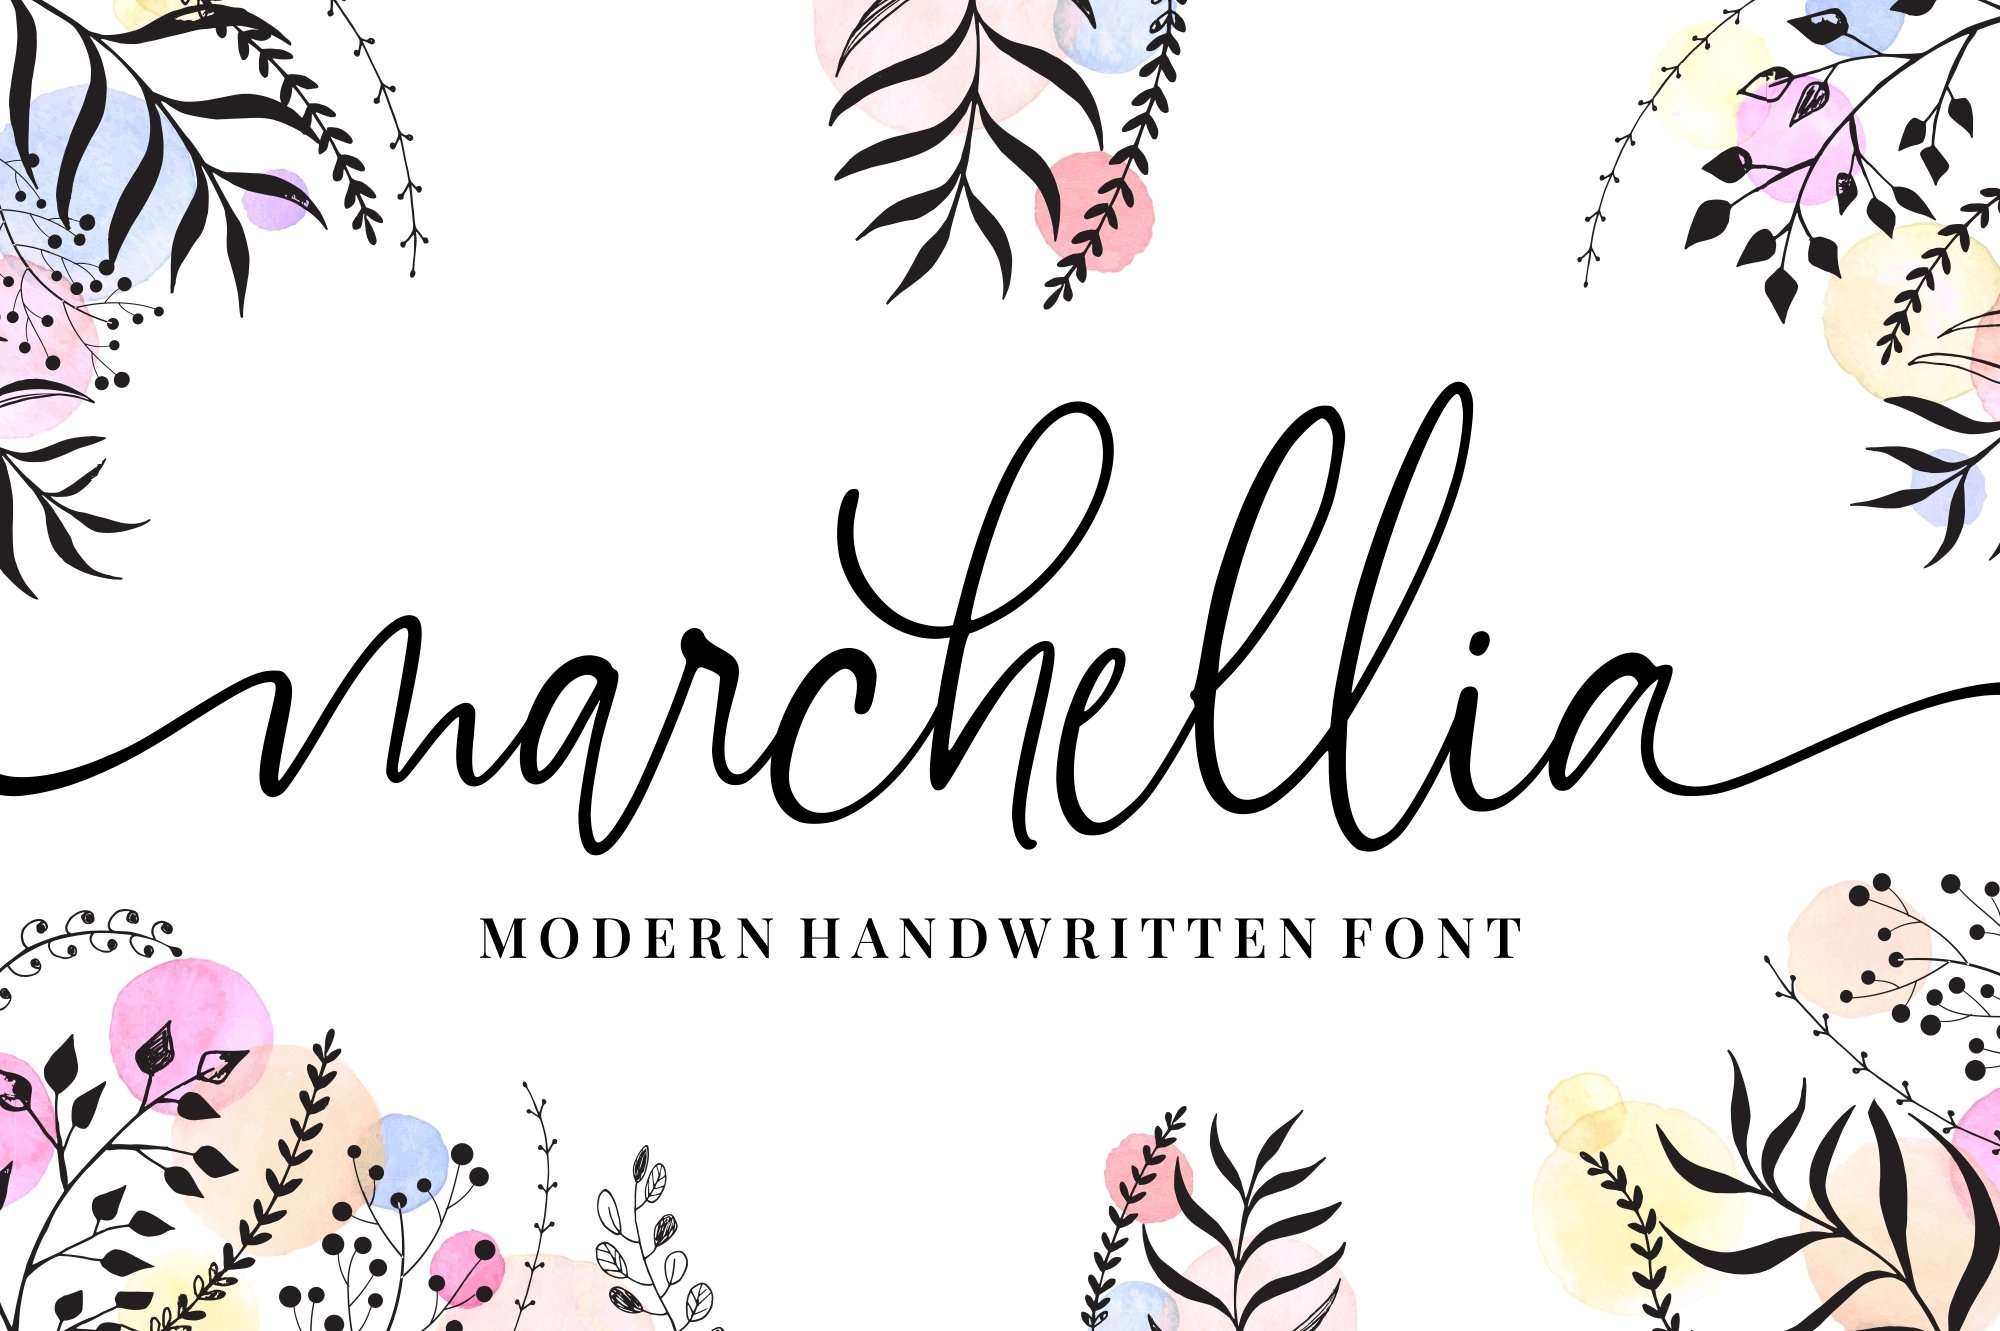 Marchellia - Modern Handwritten Font example image 1